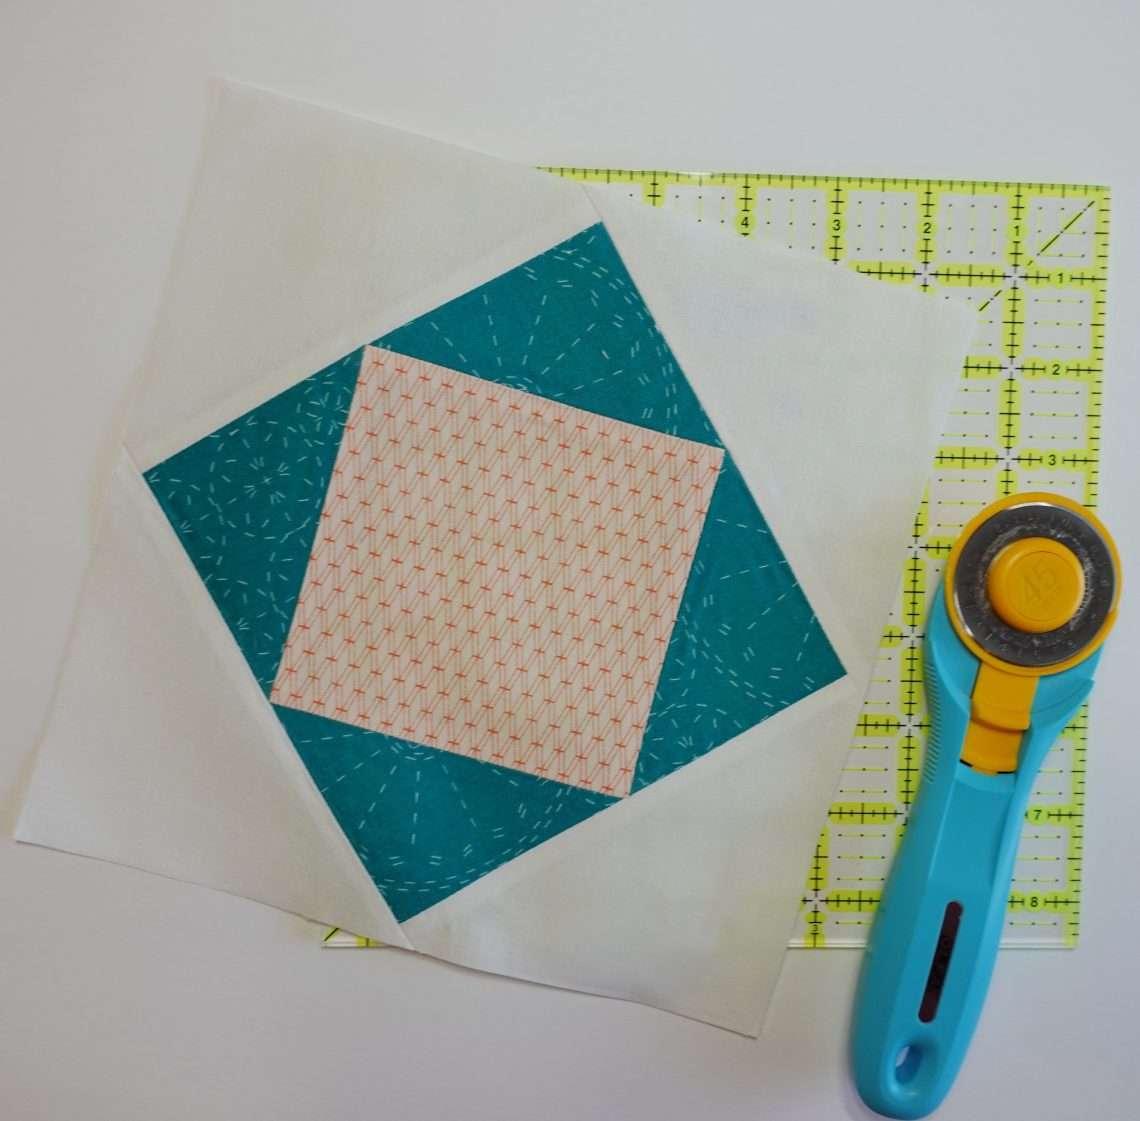 Economy Quilt Block tutorial for beginner quilters